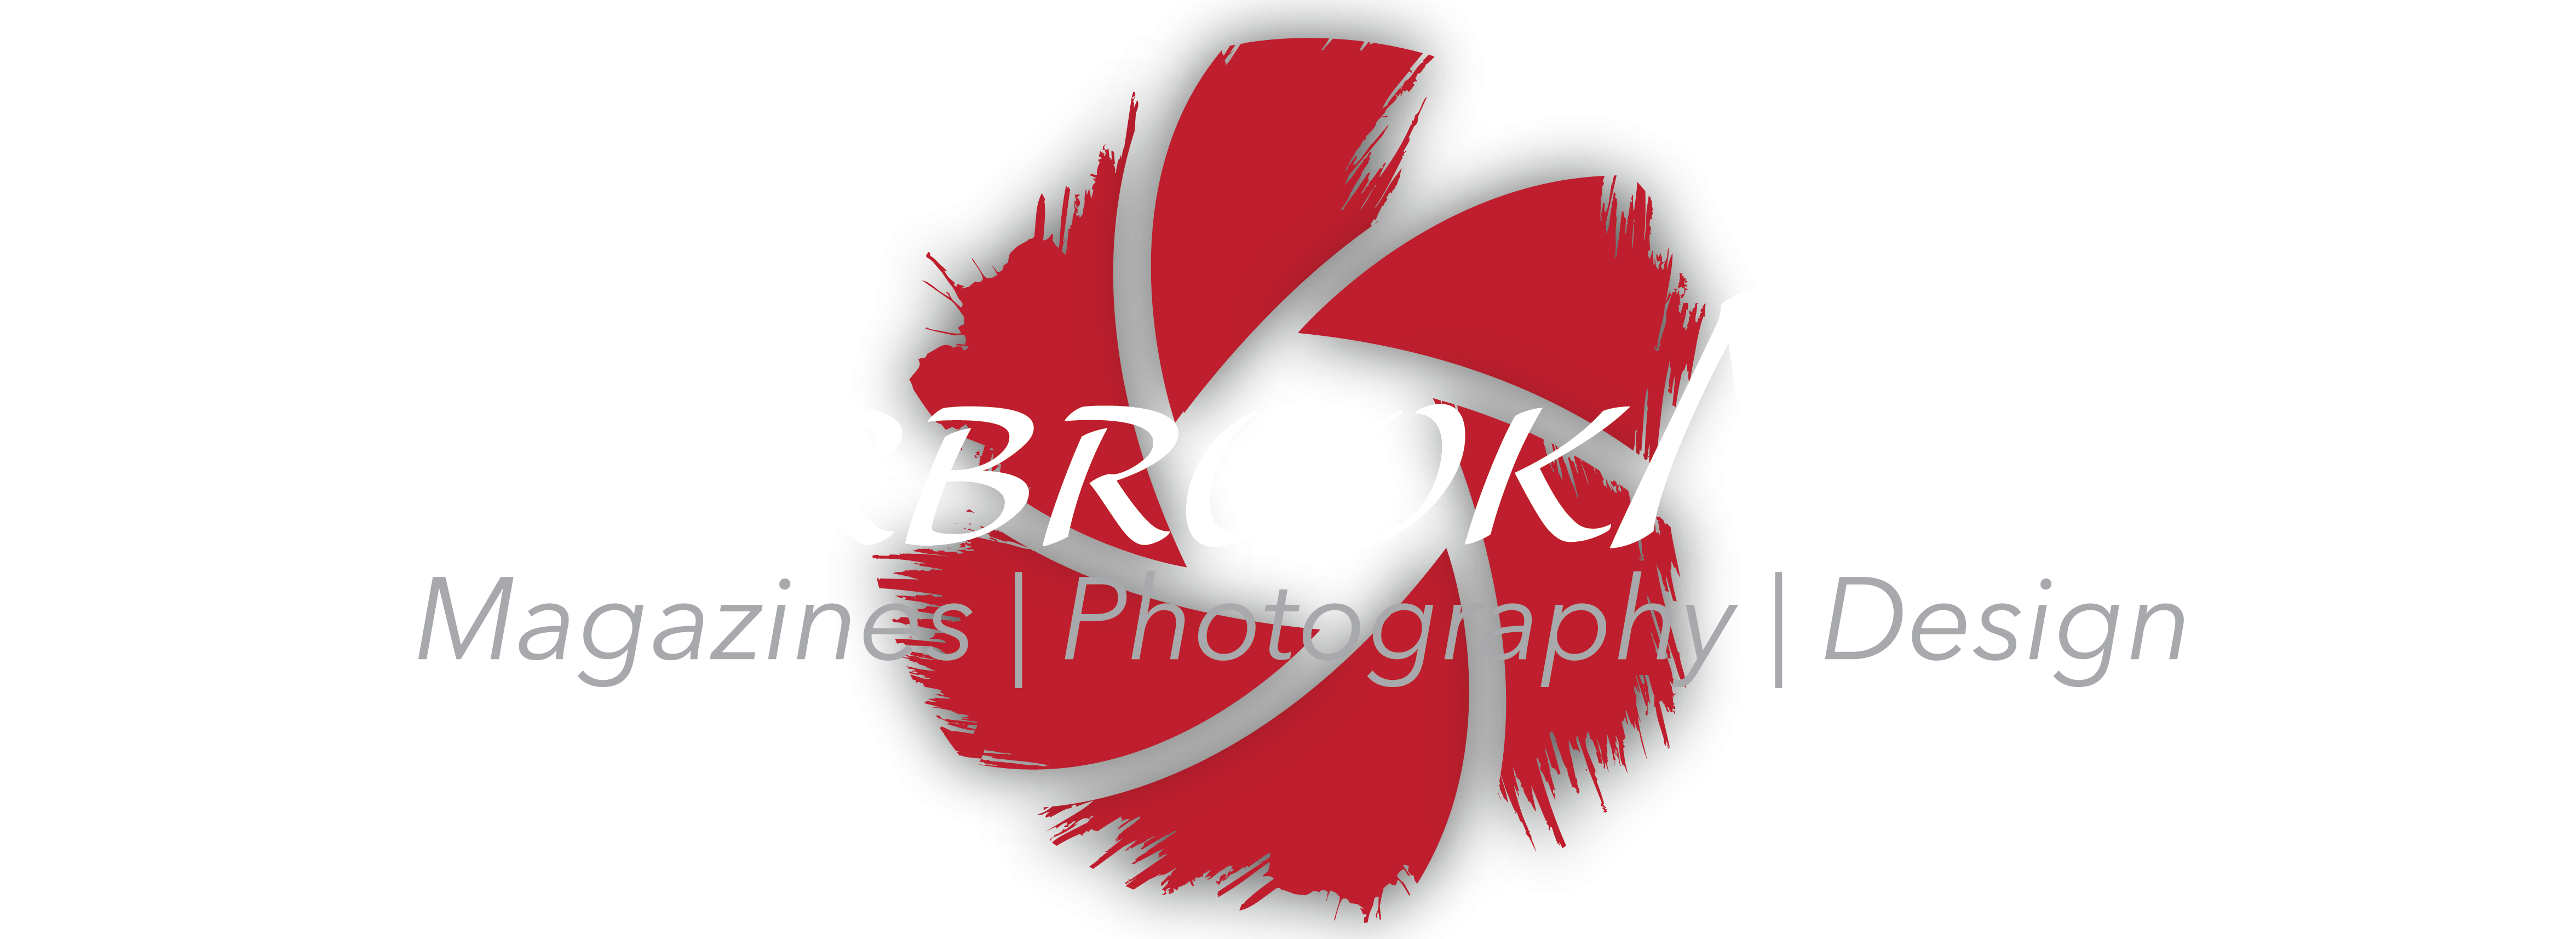 Cedarbrook Media Group, LLC